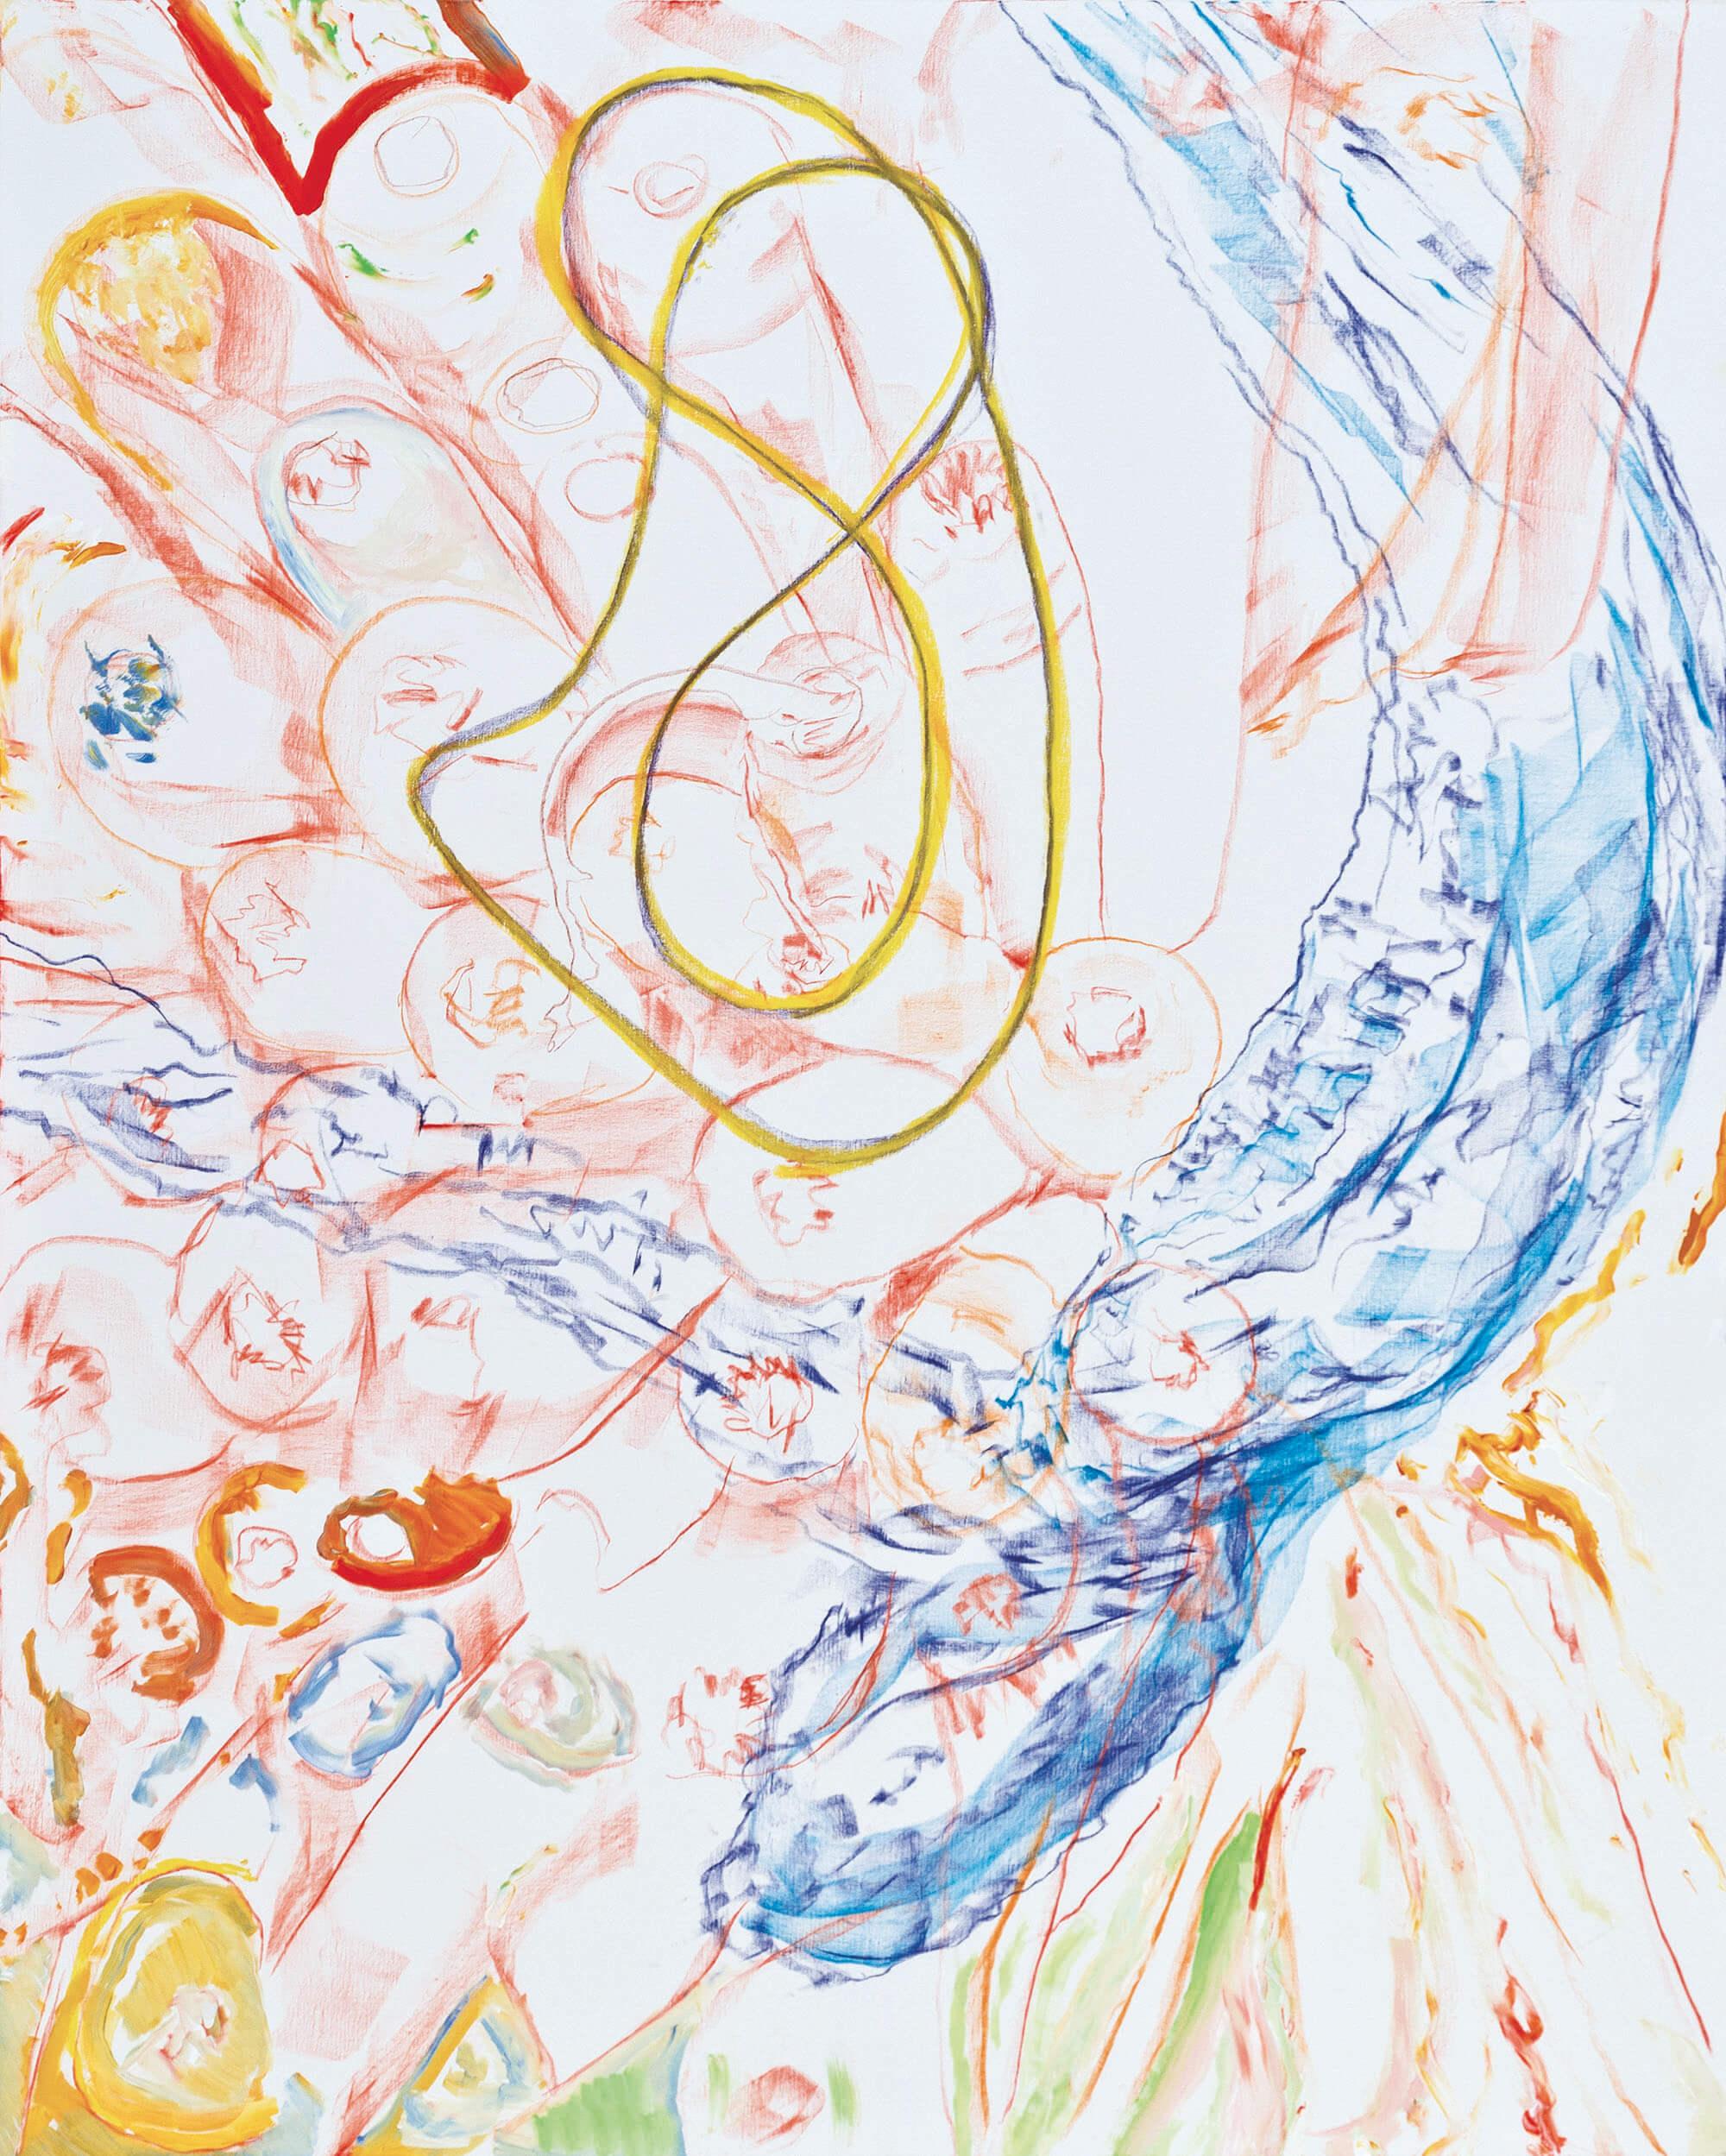 Tamaris Tree (acrylic, pastel and pencil on canvas, 163 x 130 cm - 2012)